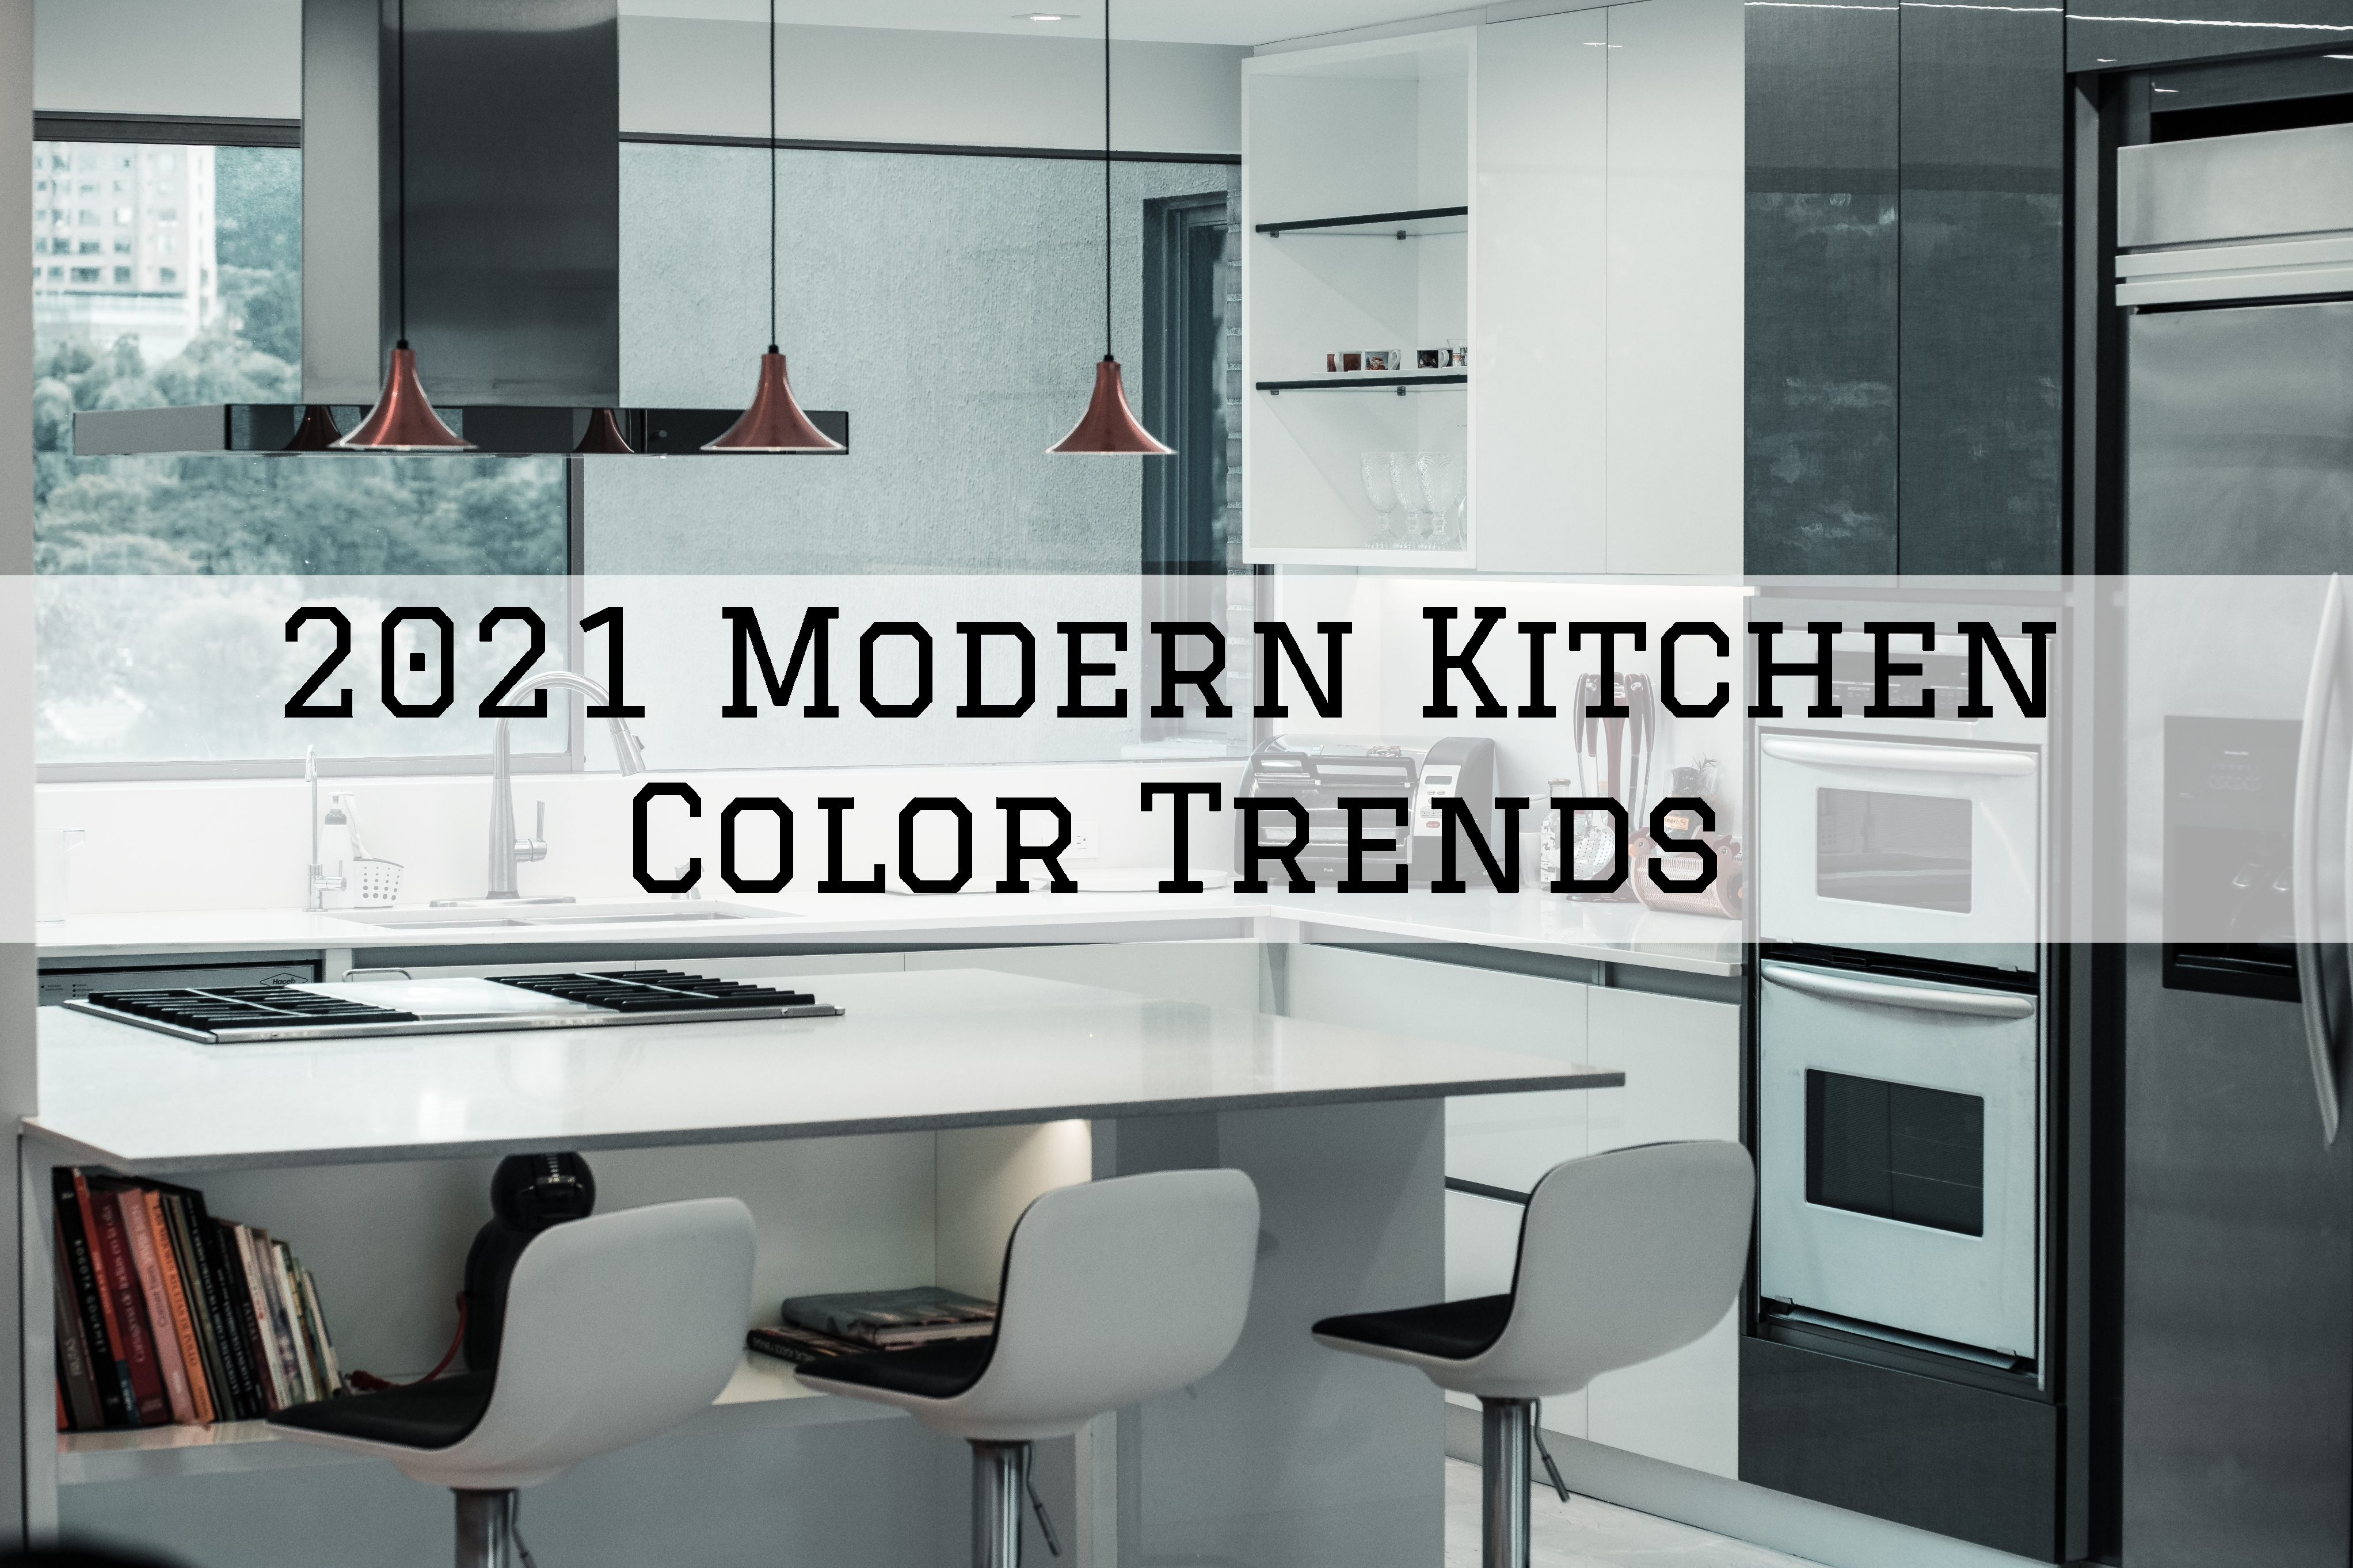 2021 Modern Kitchen Color Trends in Omaha, NE.